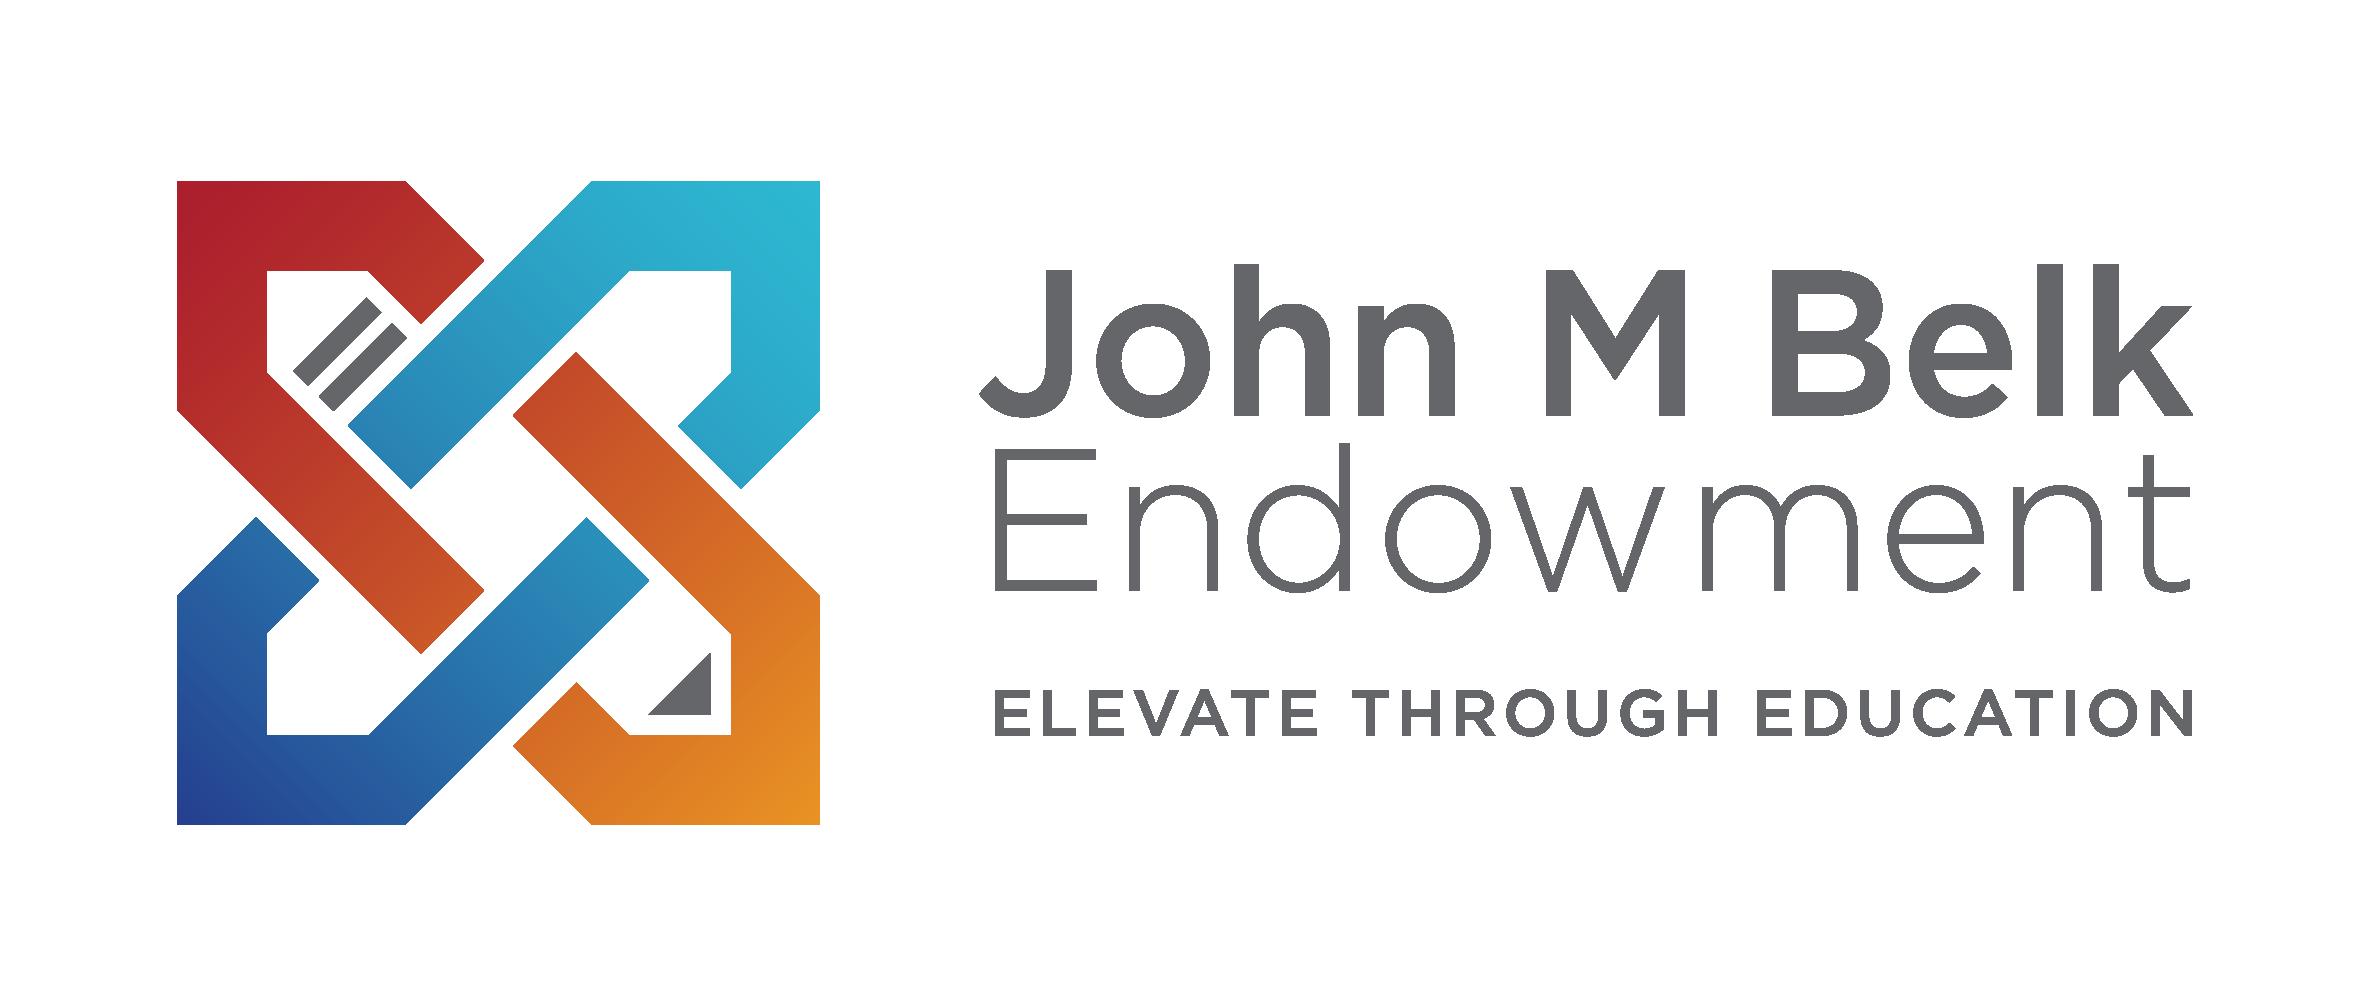 Jon M. Belk Endowment Logo